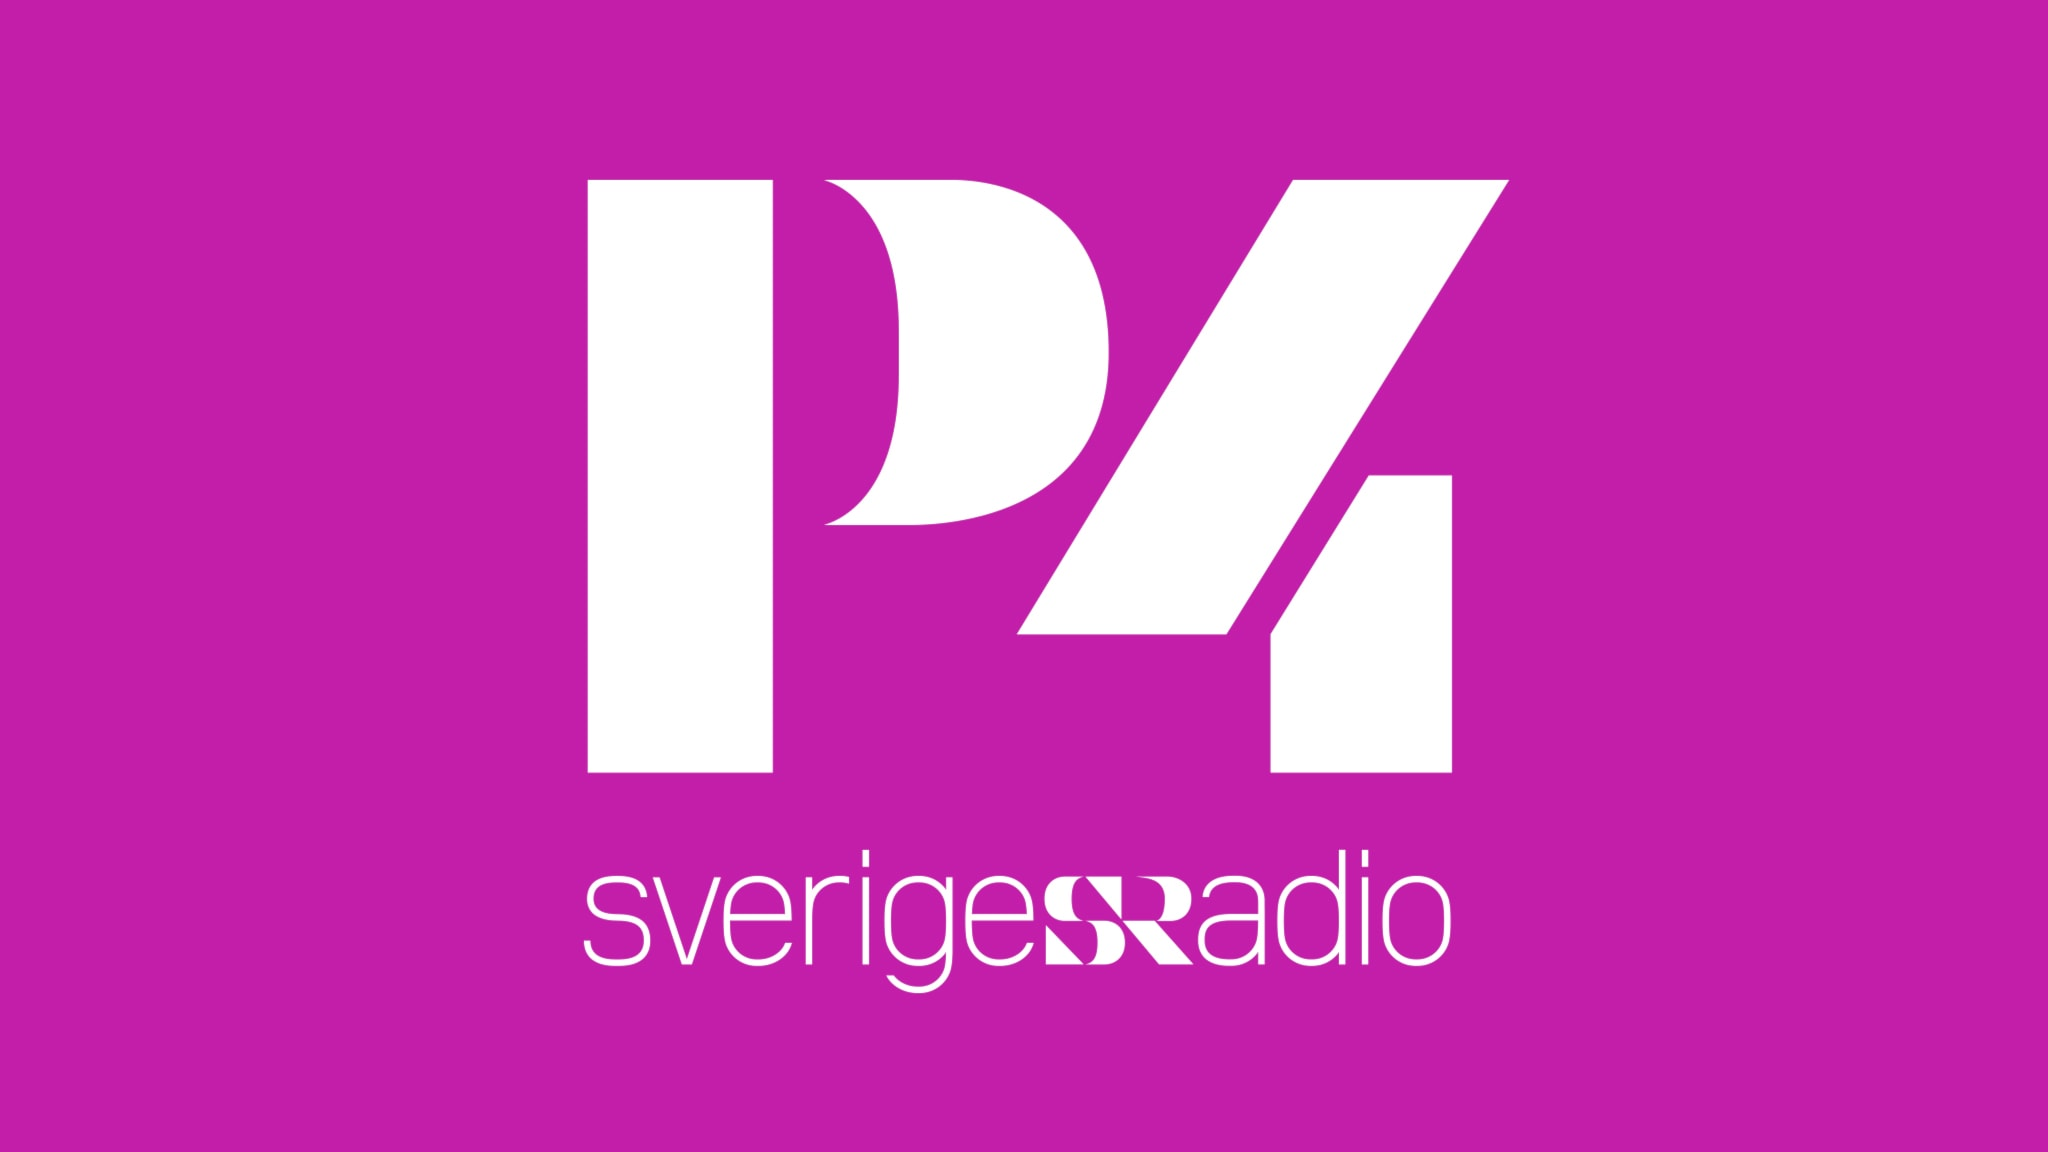 Trafik P4 Göteborg 20200703 17.10 (00.21) - spela